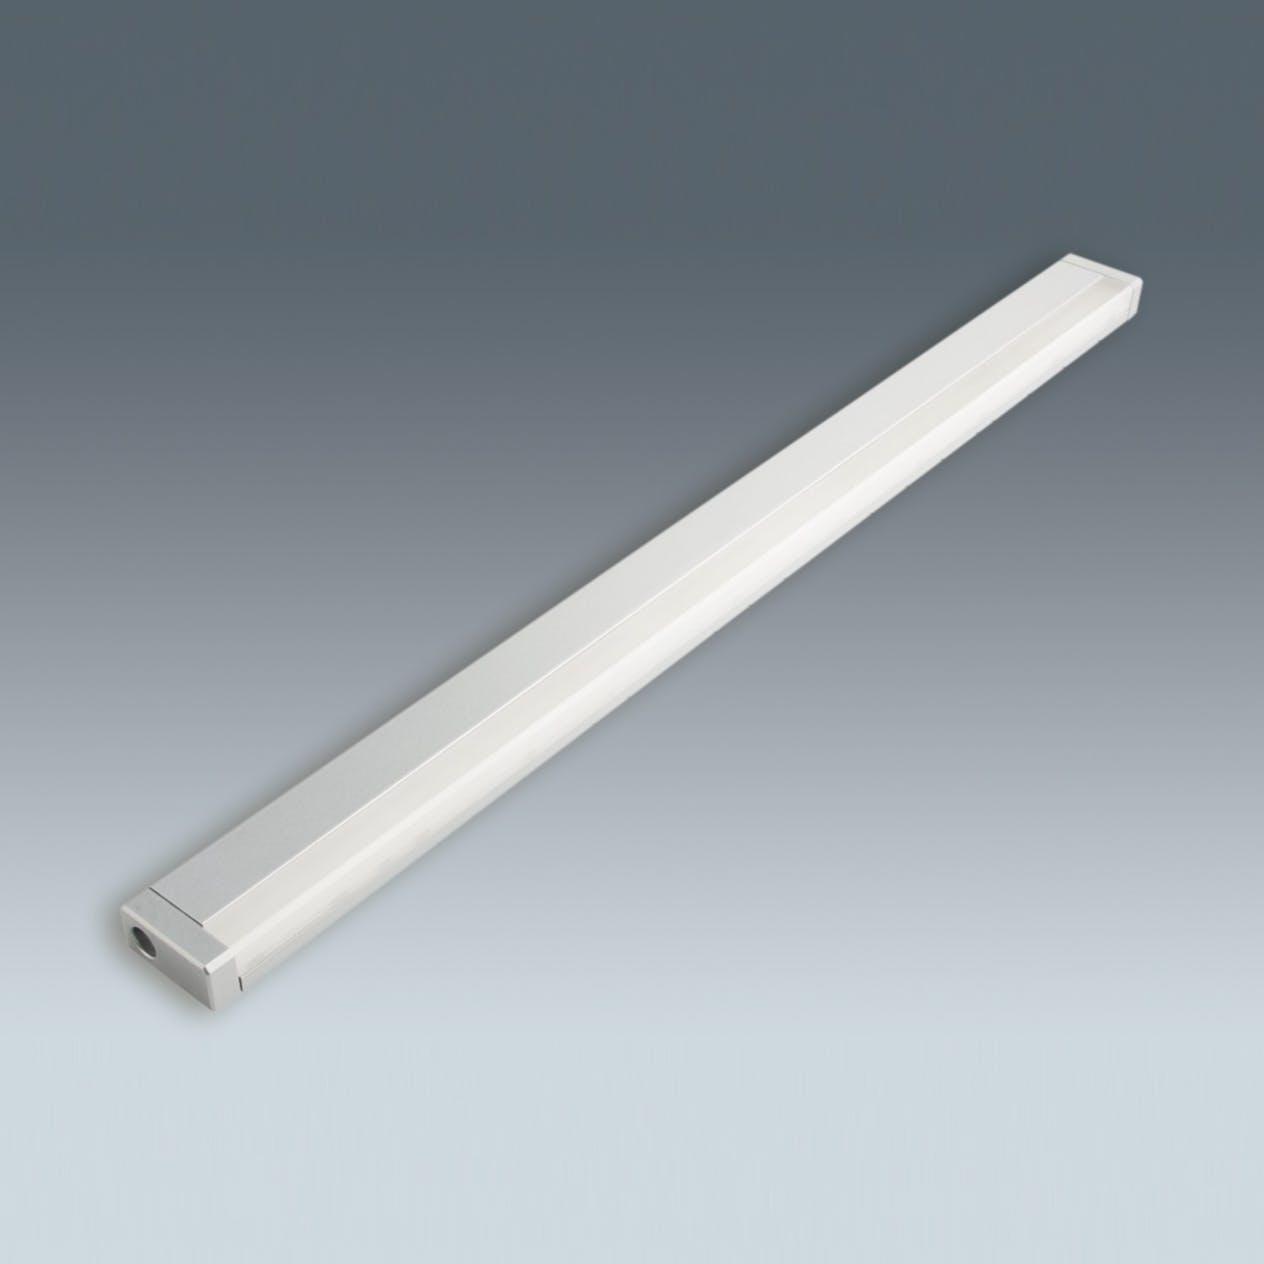 Fräscha LED-Armatur Beslag Design LD8010-A DIM - 989727 hos Golvshop.se KL-26